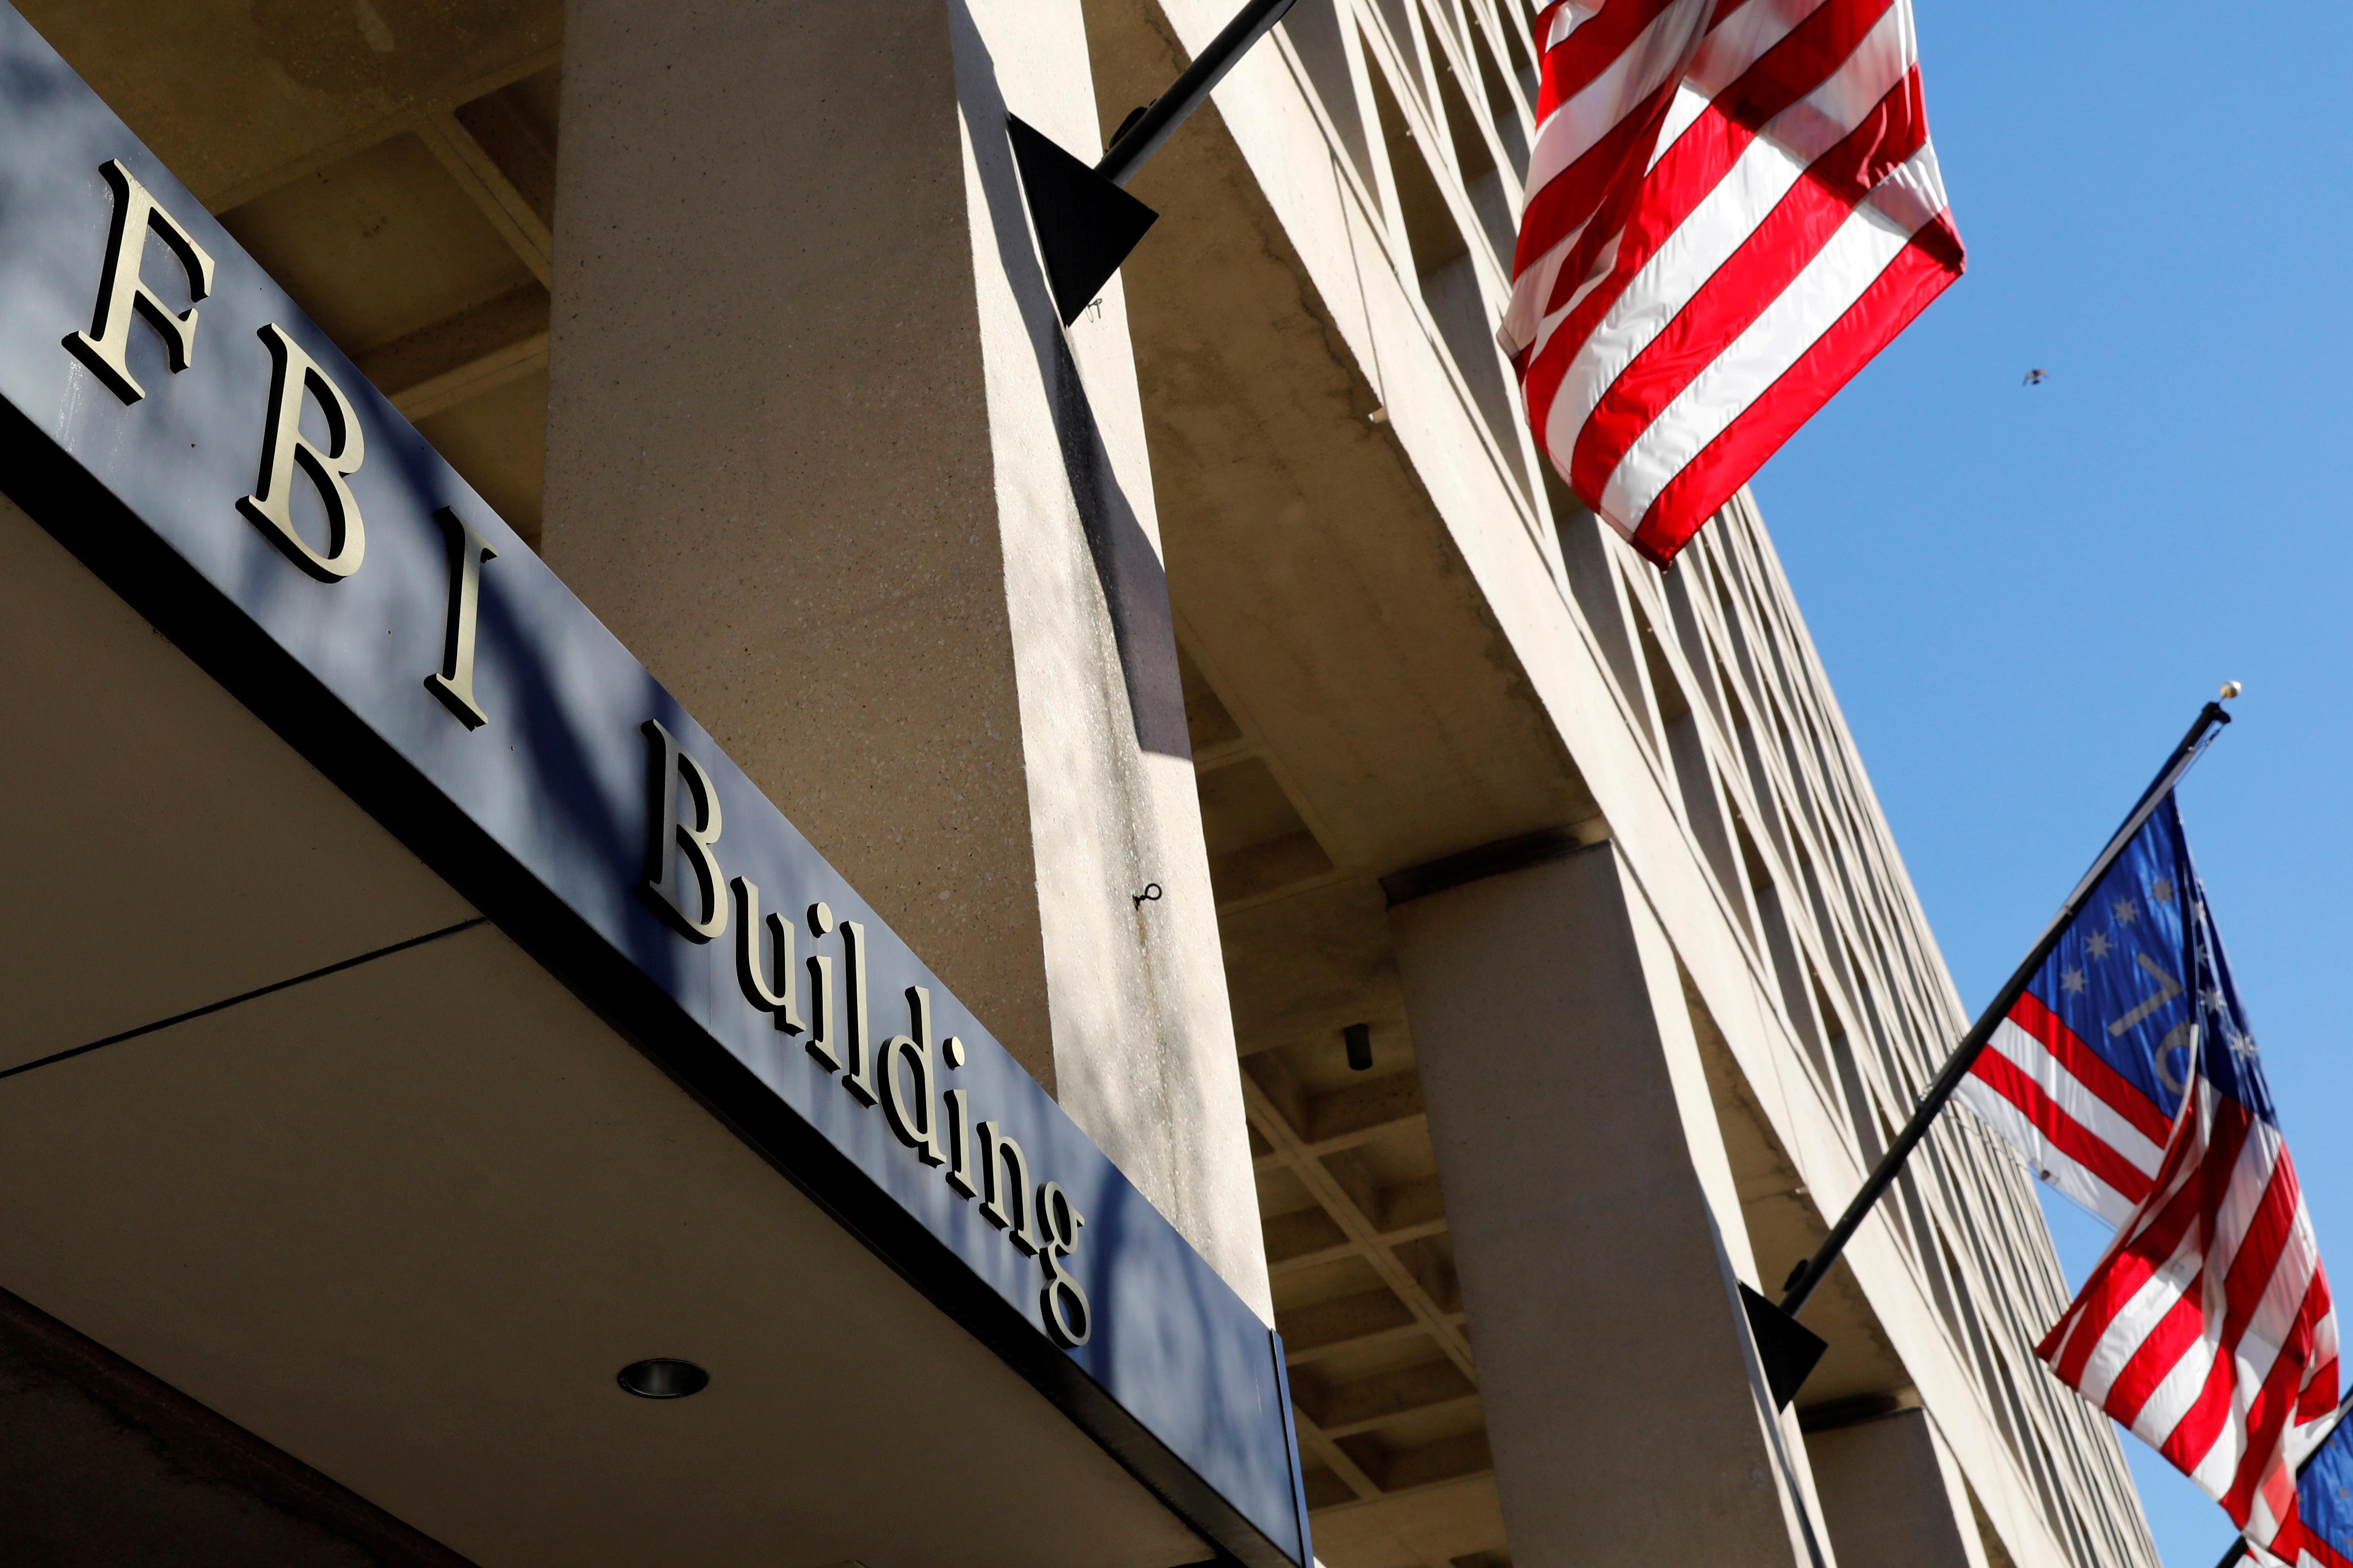 FBI headquarters building is seen in Washington, U.S., December 7, 2018. REUTERS/Yuri Gripas/File Photo